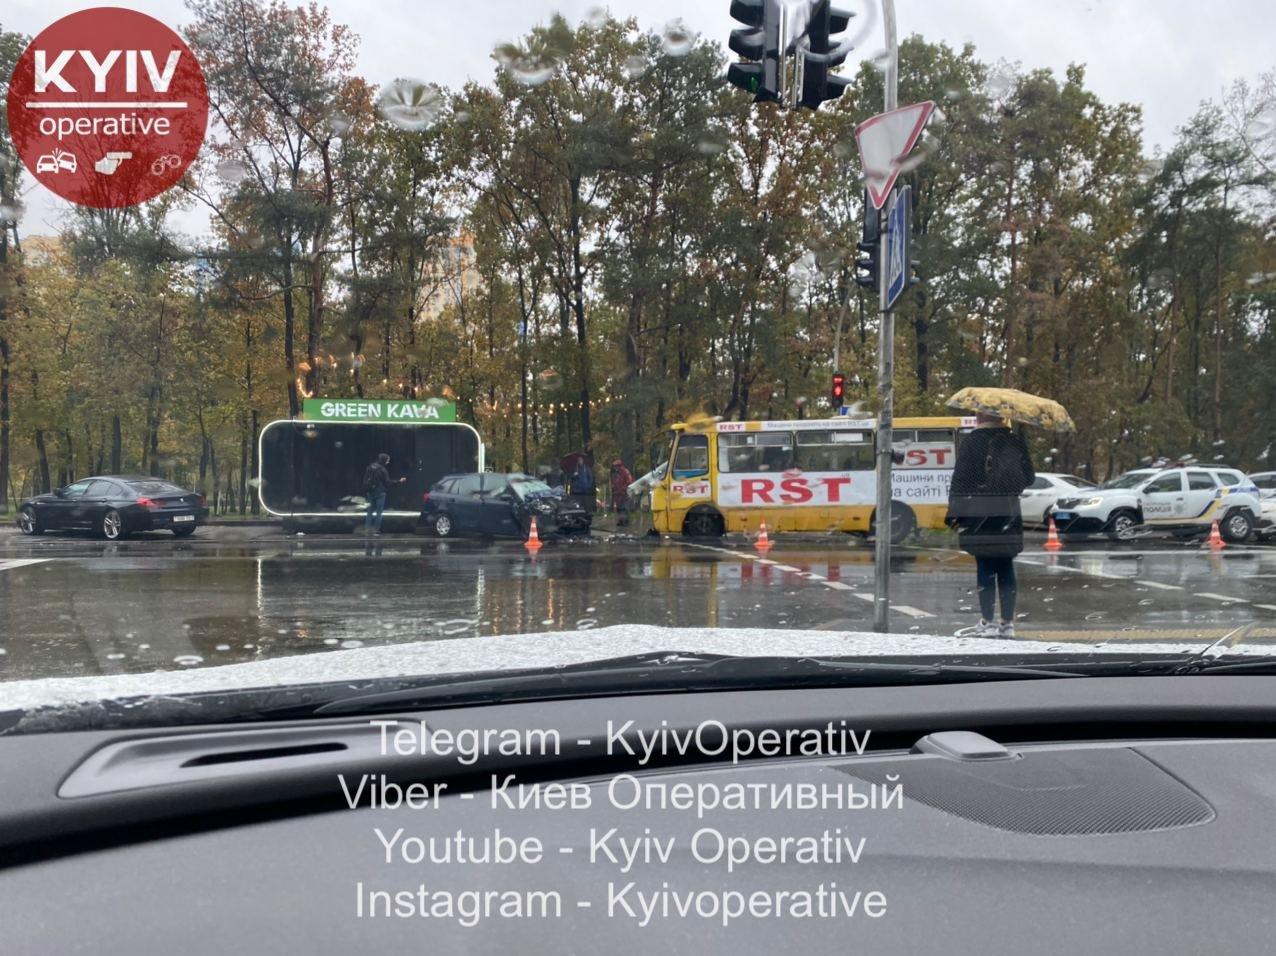 ДТП маршрутки и легковика на улице Жмаченко в Кмеве, Фото Киев оперативный